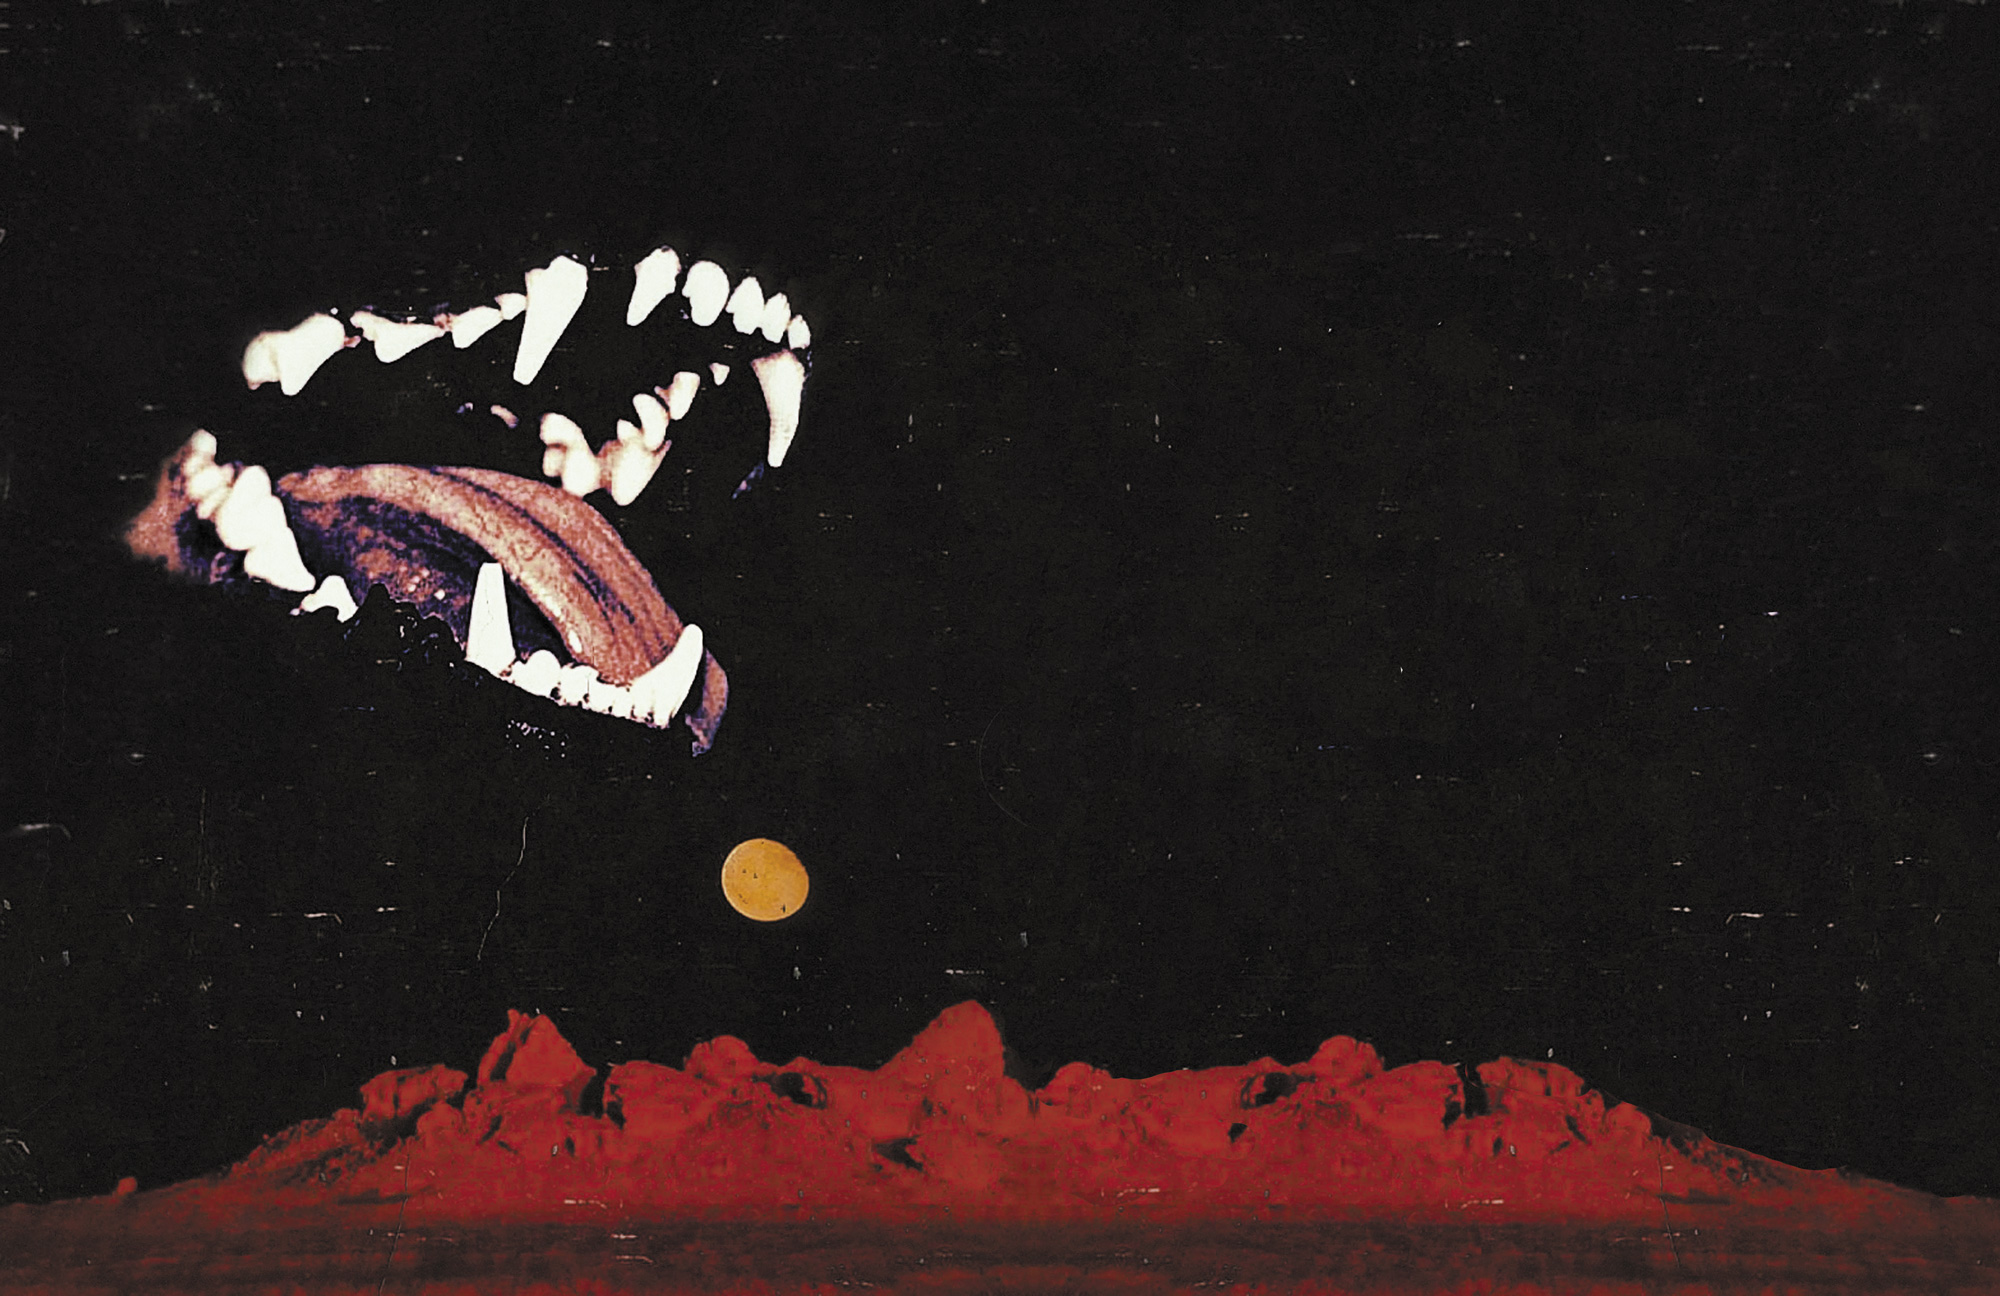 Dave Danzara The Killing Moon for Howl by Gray Winsler Birdy 091